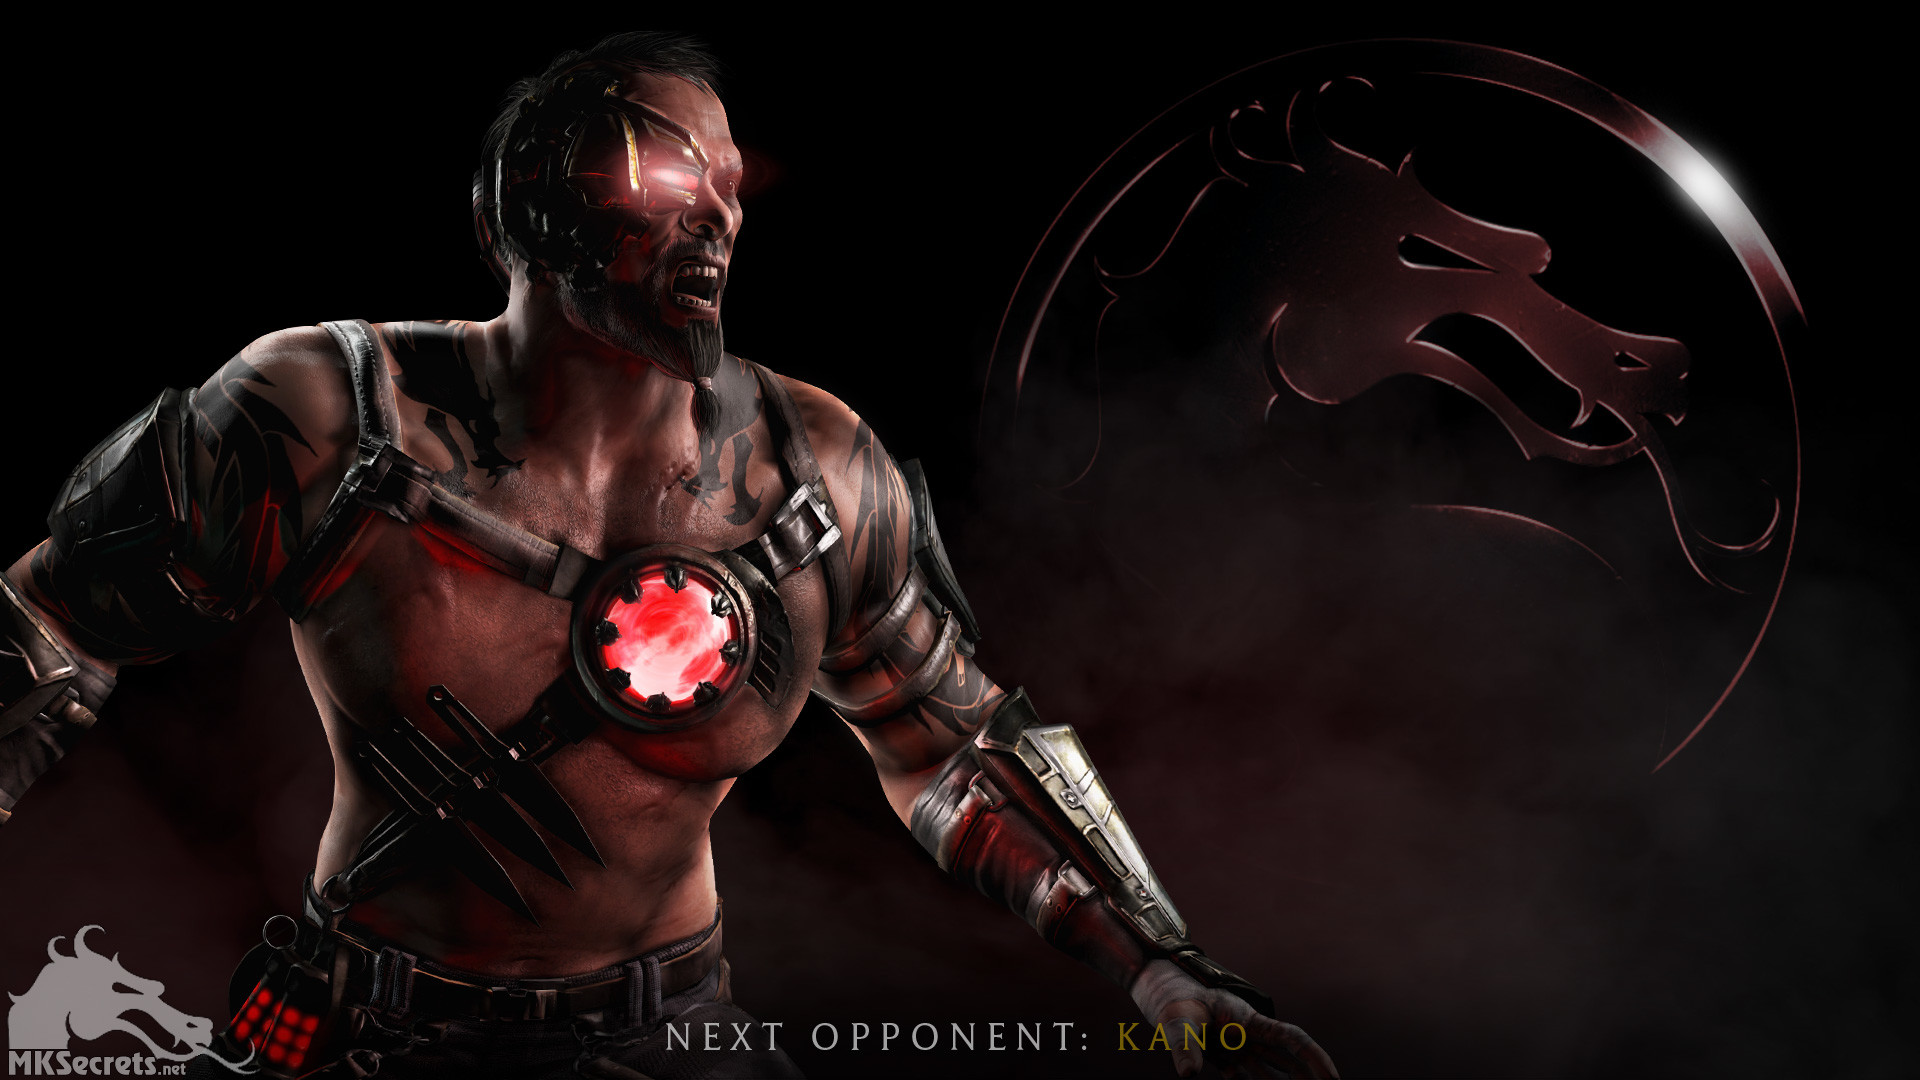 Wallpaper takeda takahashi, mortal kombat x, earthly kingdom | Game |  Pinterest | Mortal kombat